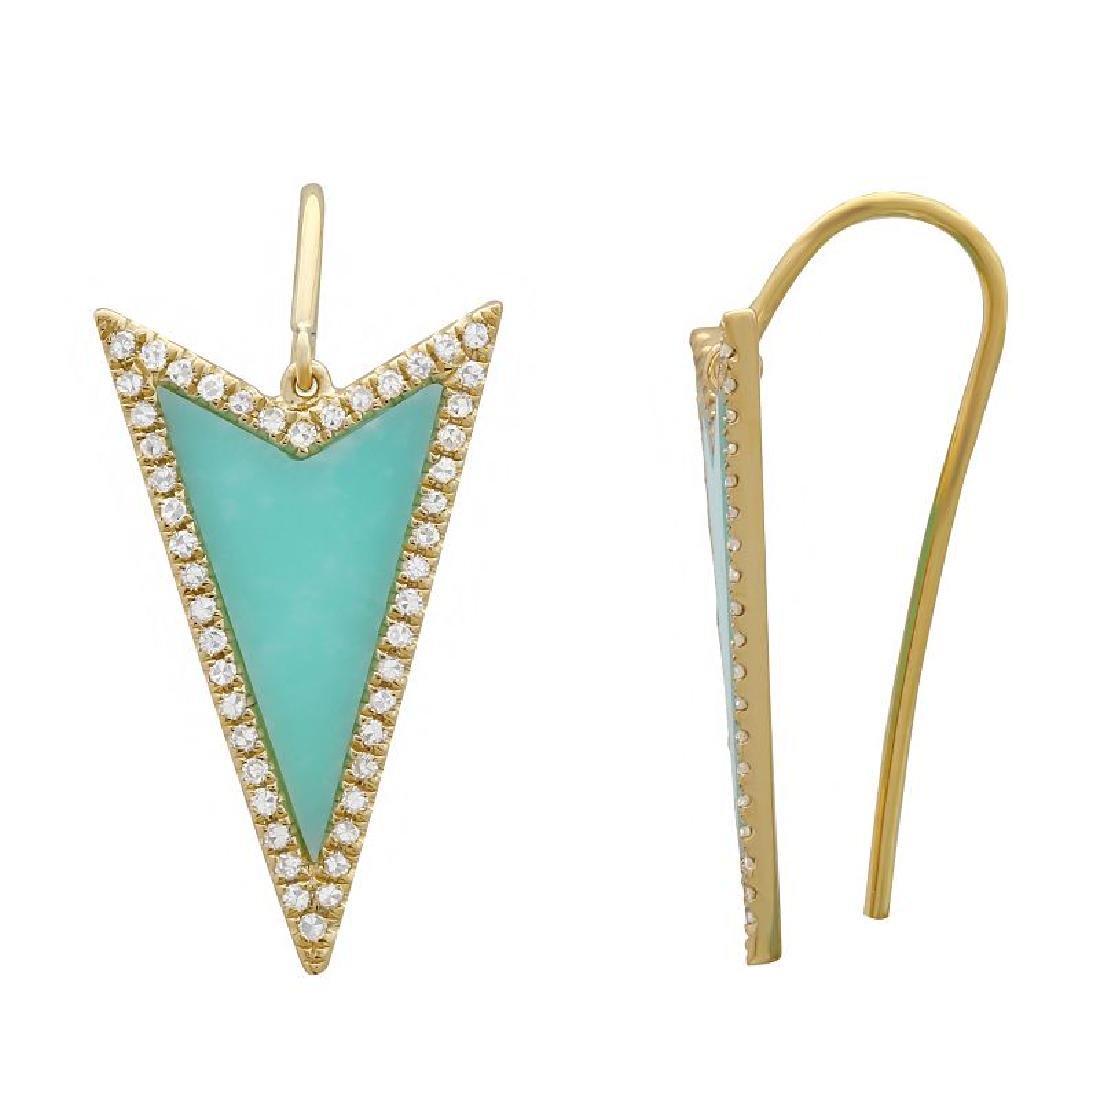 14KT Yellow Gold 1.08ctw Diamond  Turquoise Earrings